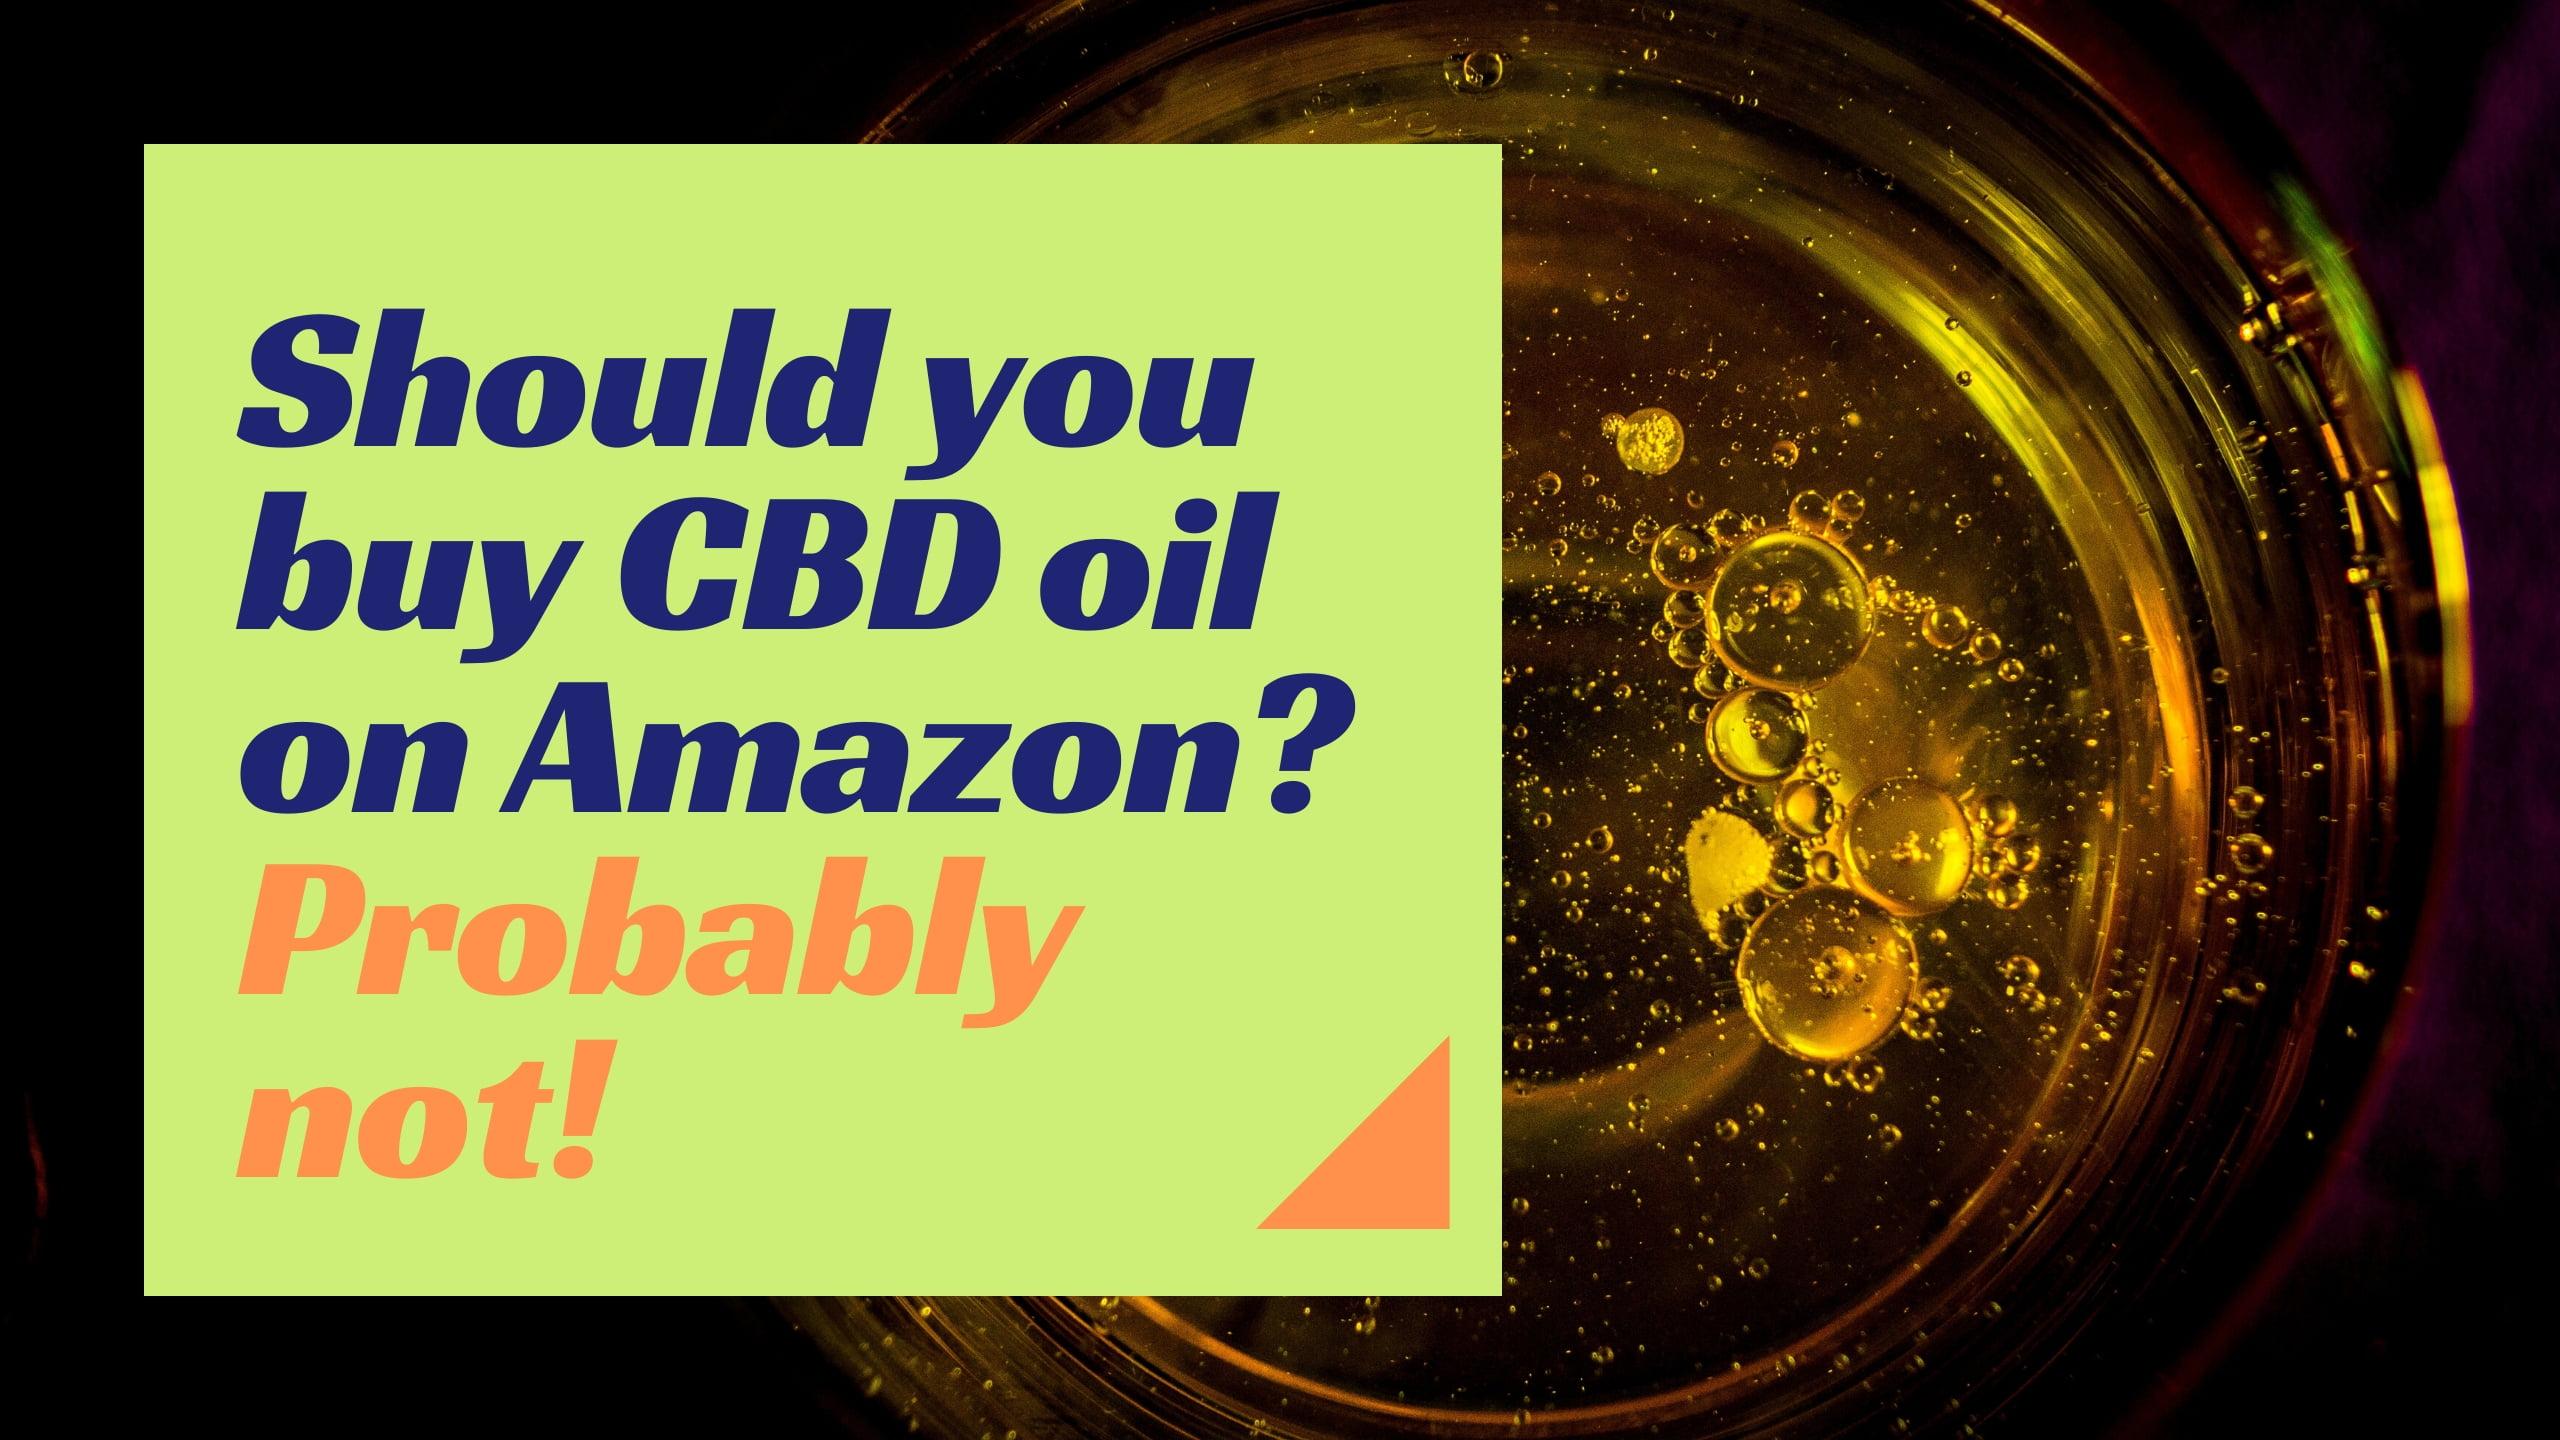 Should you buy CBD oil on Amazon? Probably not!